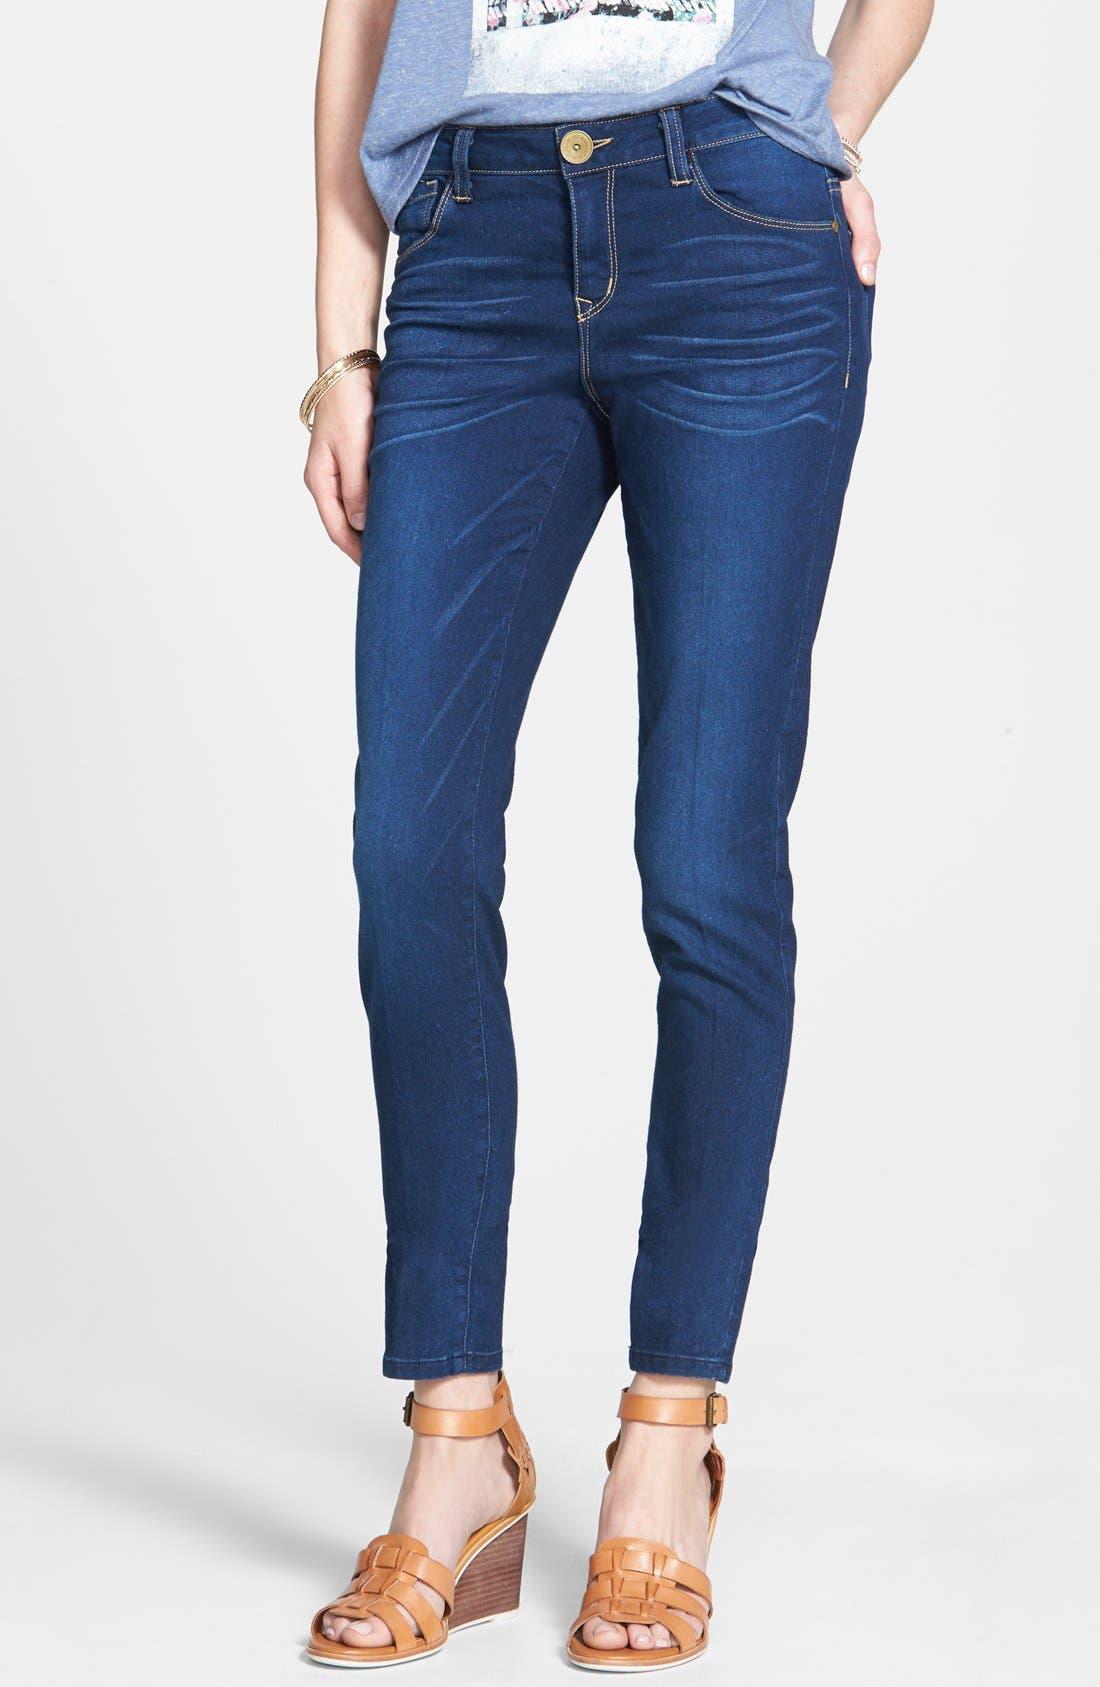 Alternate Image 1 Selected - Jolt Mid-Rise Skinny Jeans (Dark)